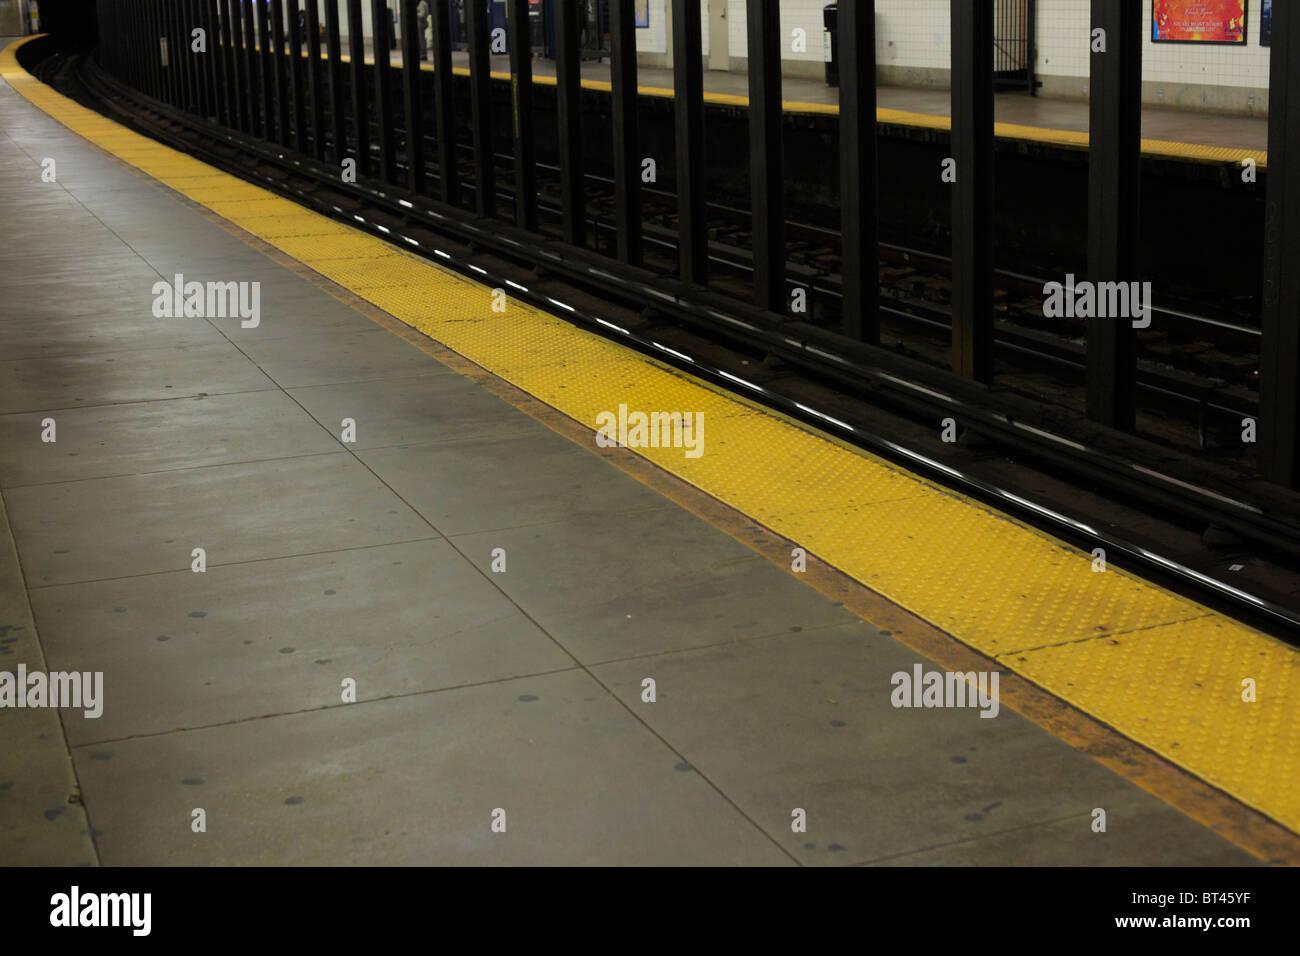 Empty Subway platform New York City - Stock Image